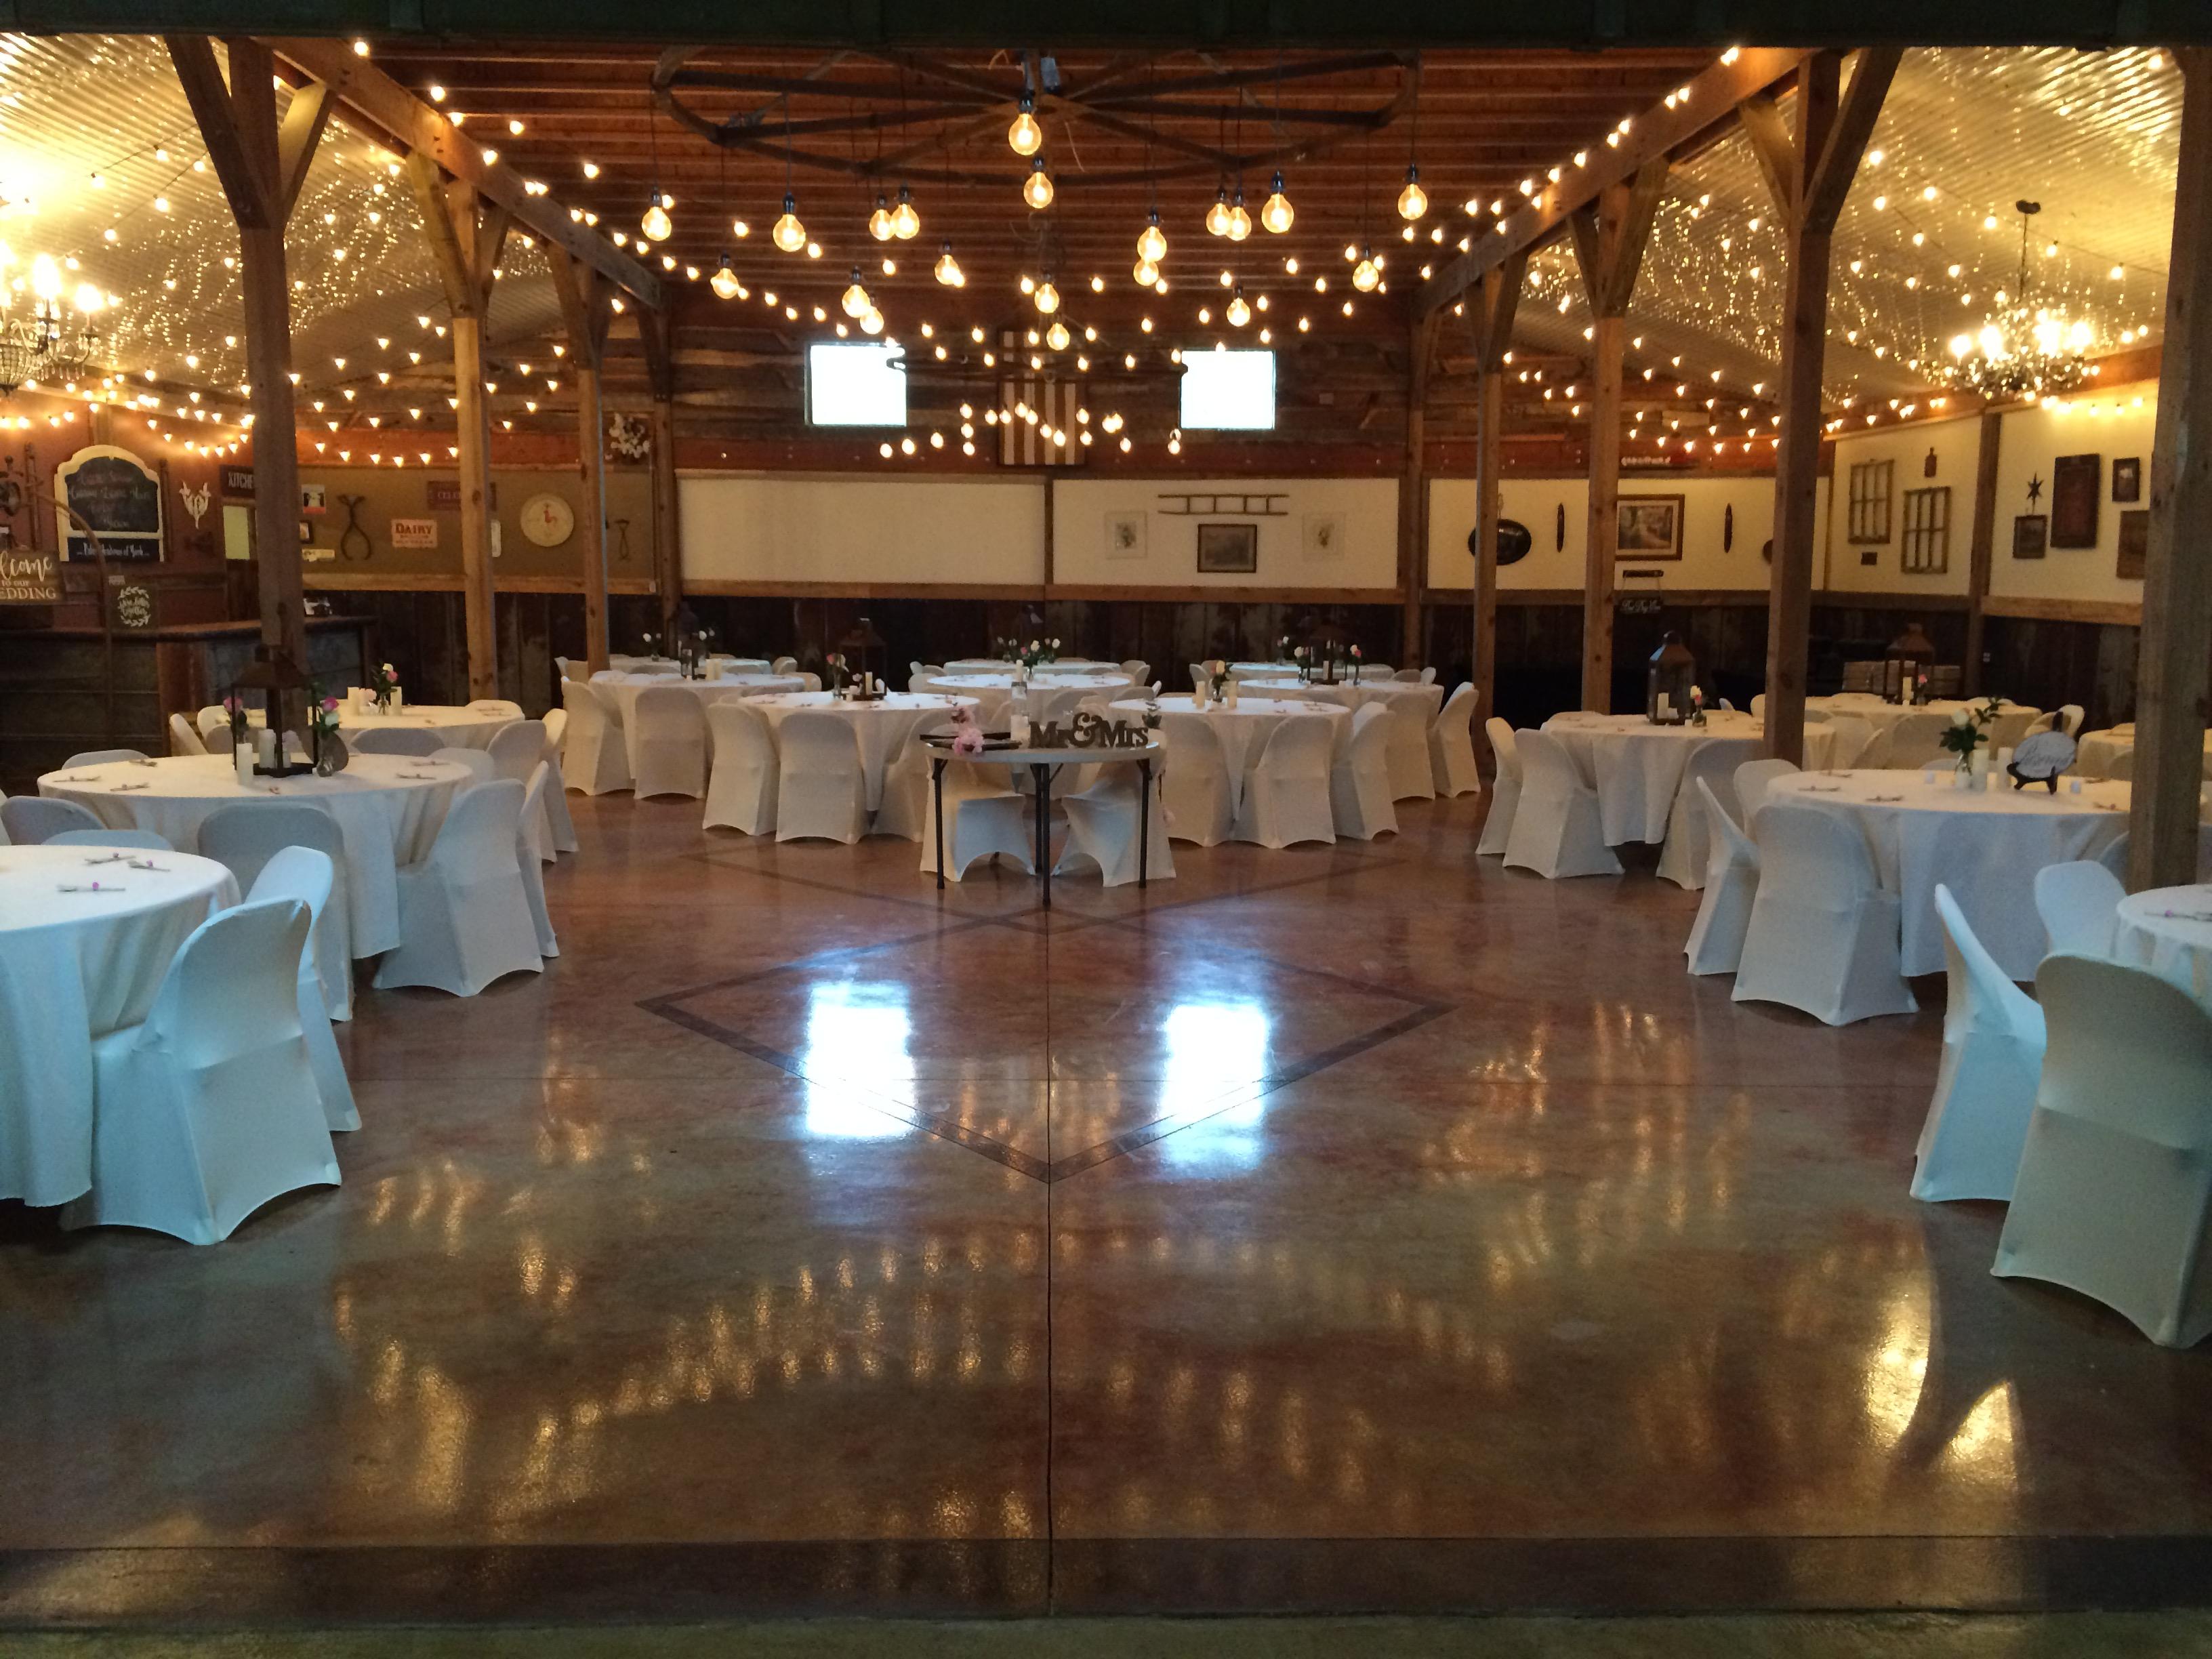 Palm Meadows of York - Rustic Wedding Venues in South ...